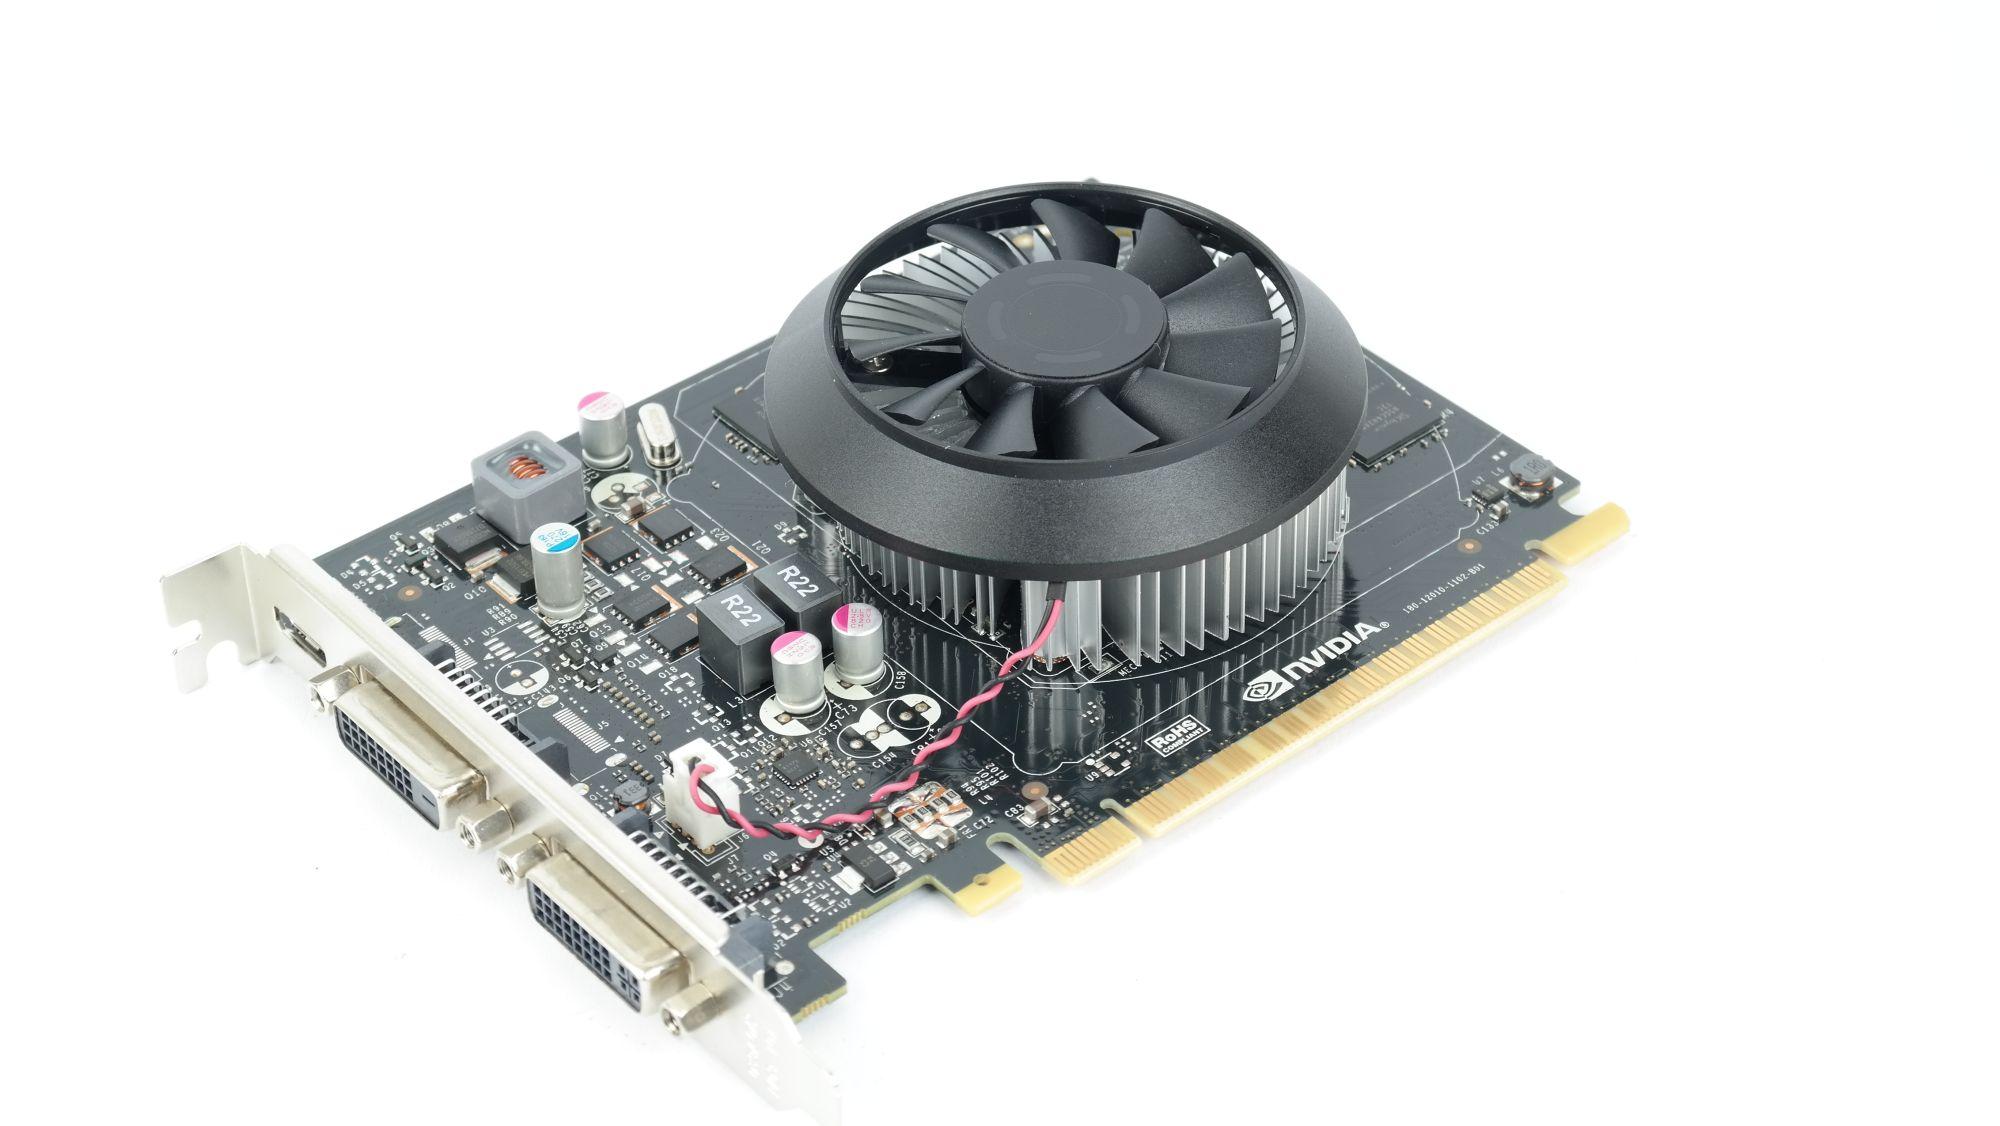 https://www.nordichardware.se/images/labswedish/artiklar/Grafik/Nvidia_Geforce_GTX_750_Ti/fullimages/Geforce_GTX_750Ti_003.jpg